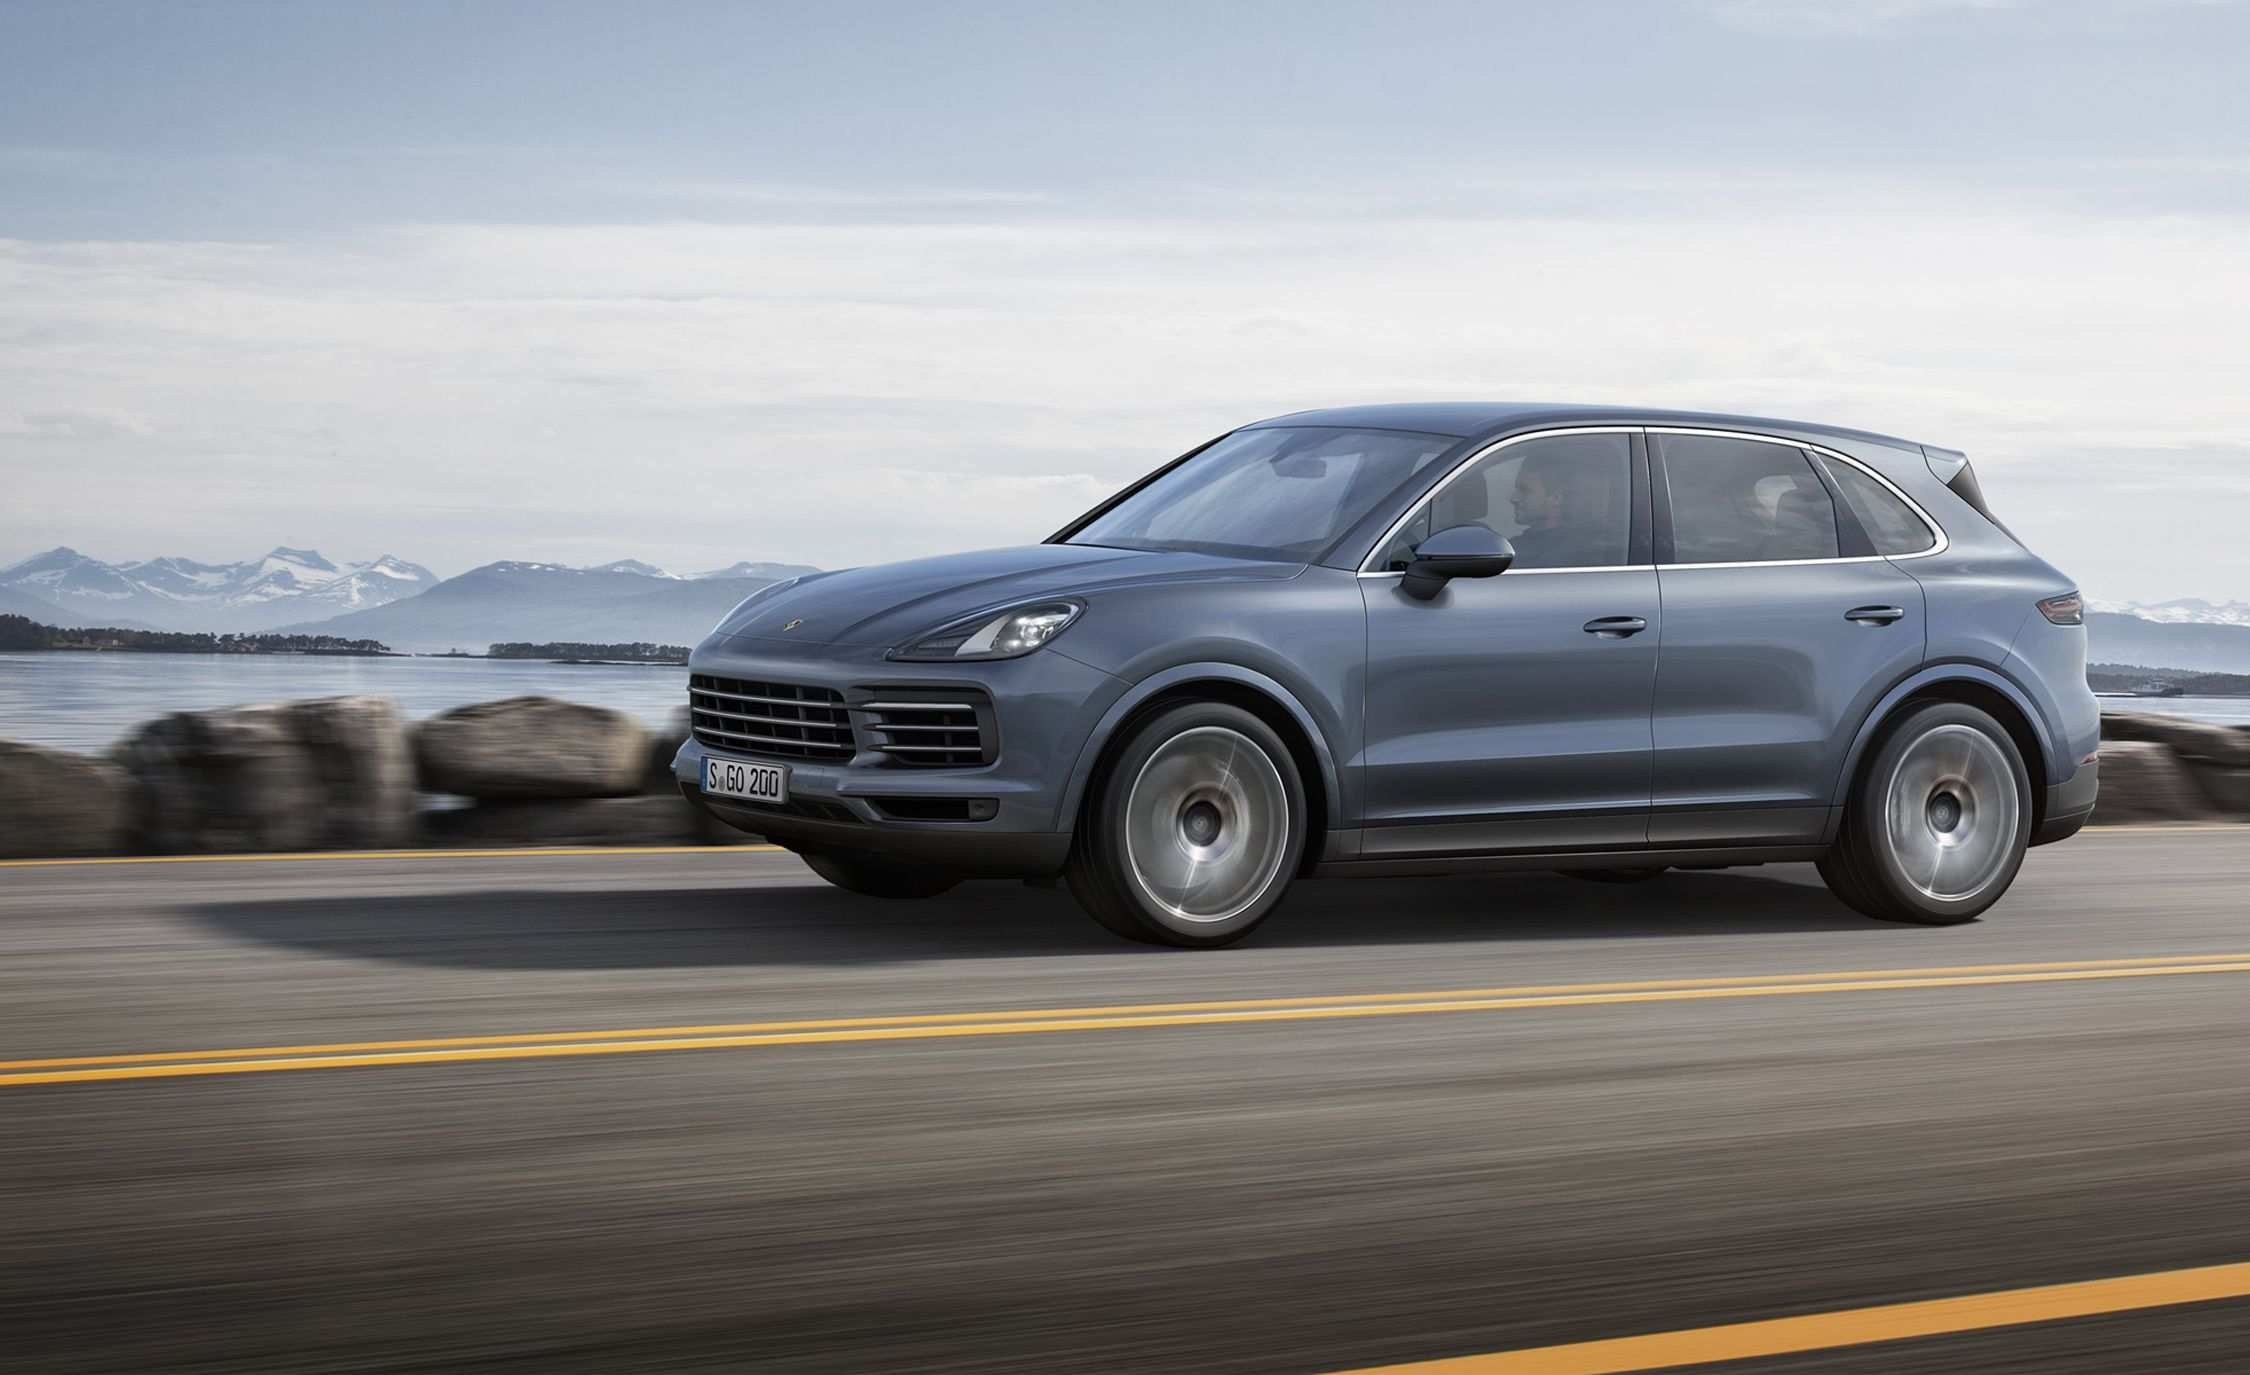 35 Concept of 2019 Porsche Cayenne First Look Wallpaper with 2019 Porsche Cayenne First Look